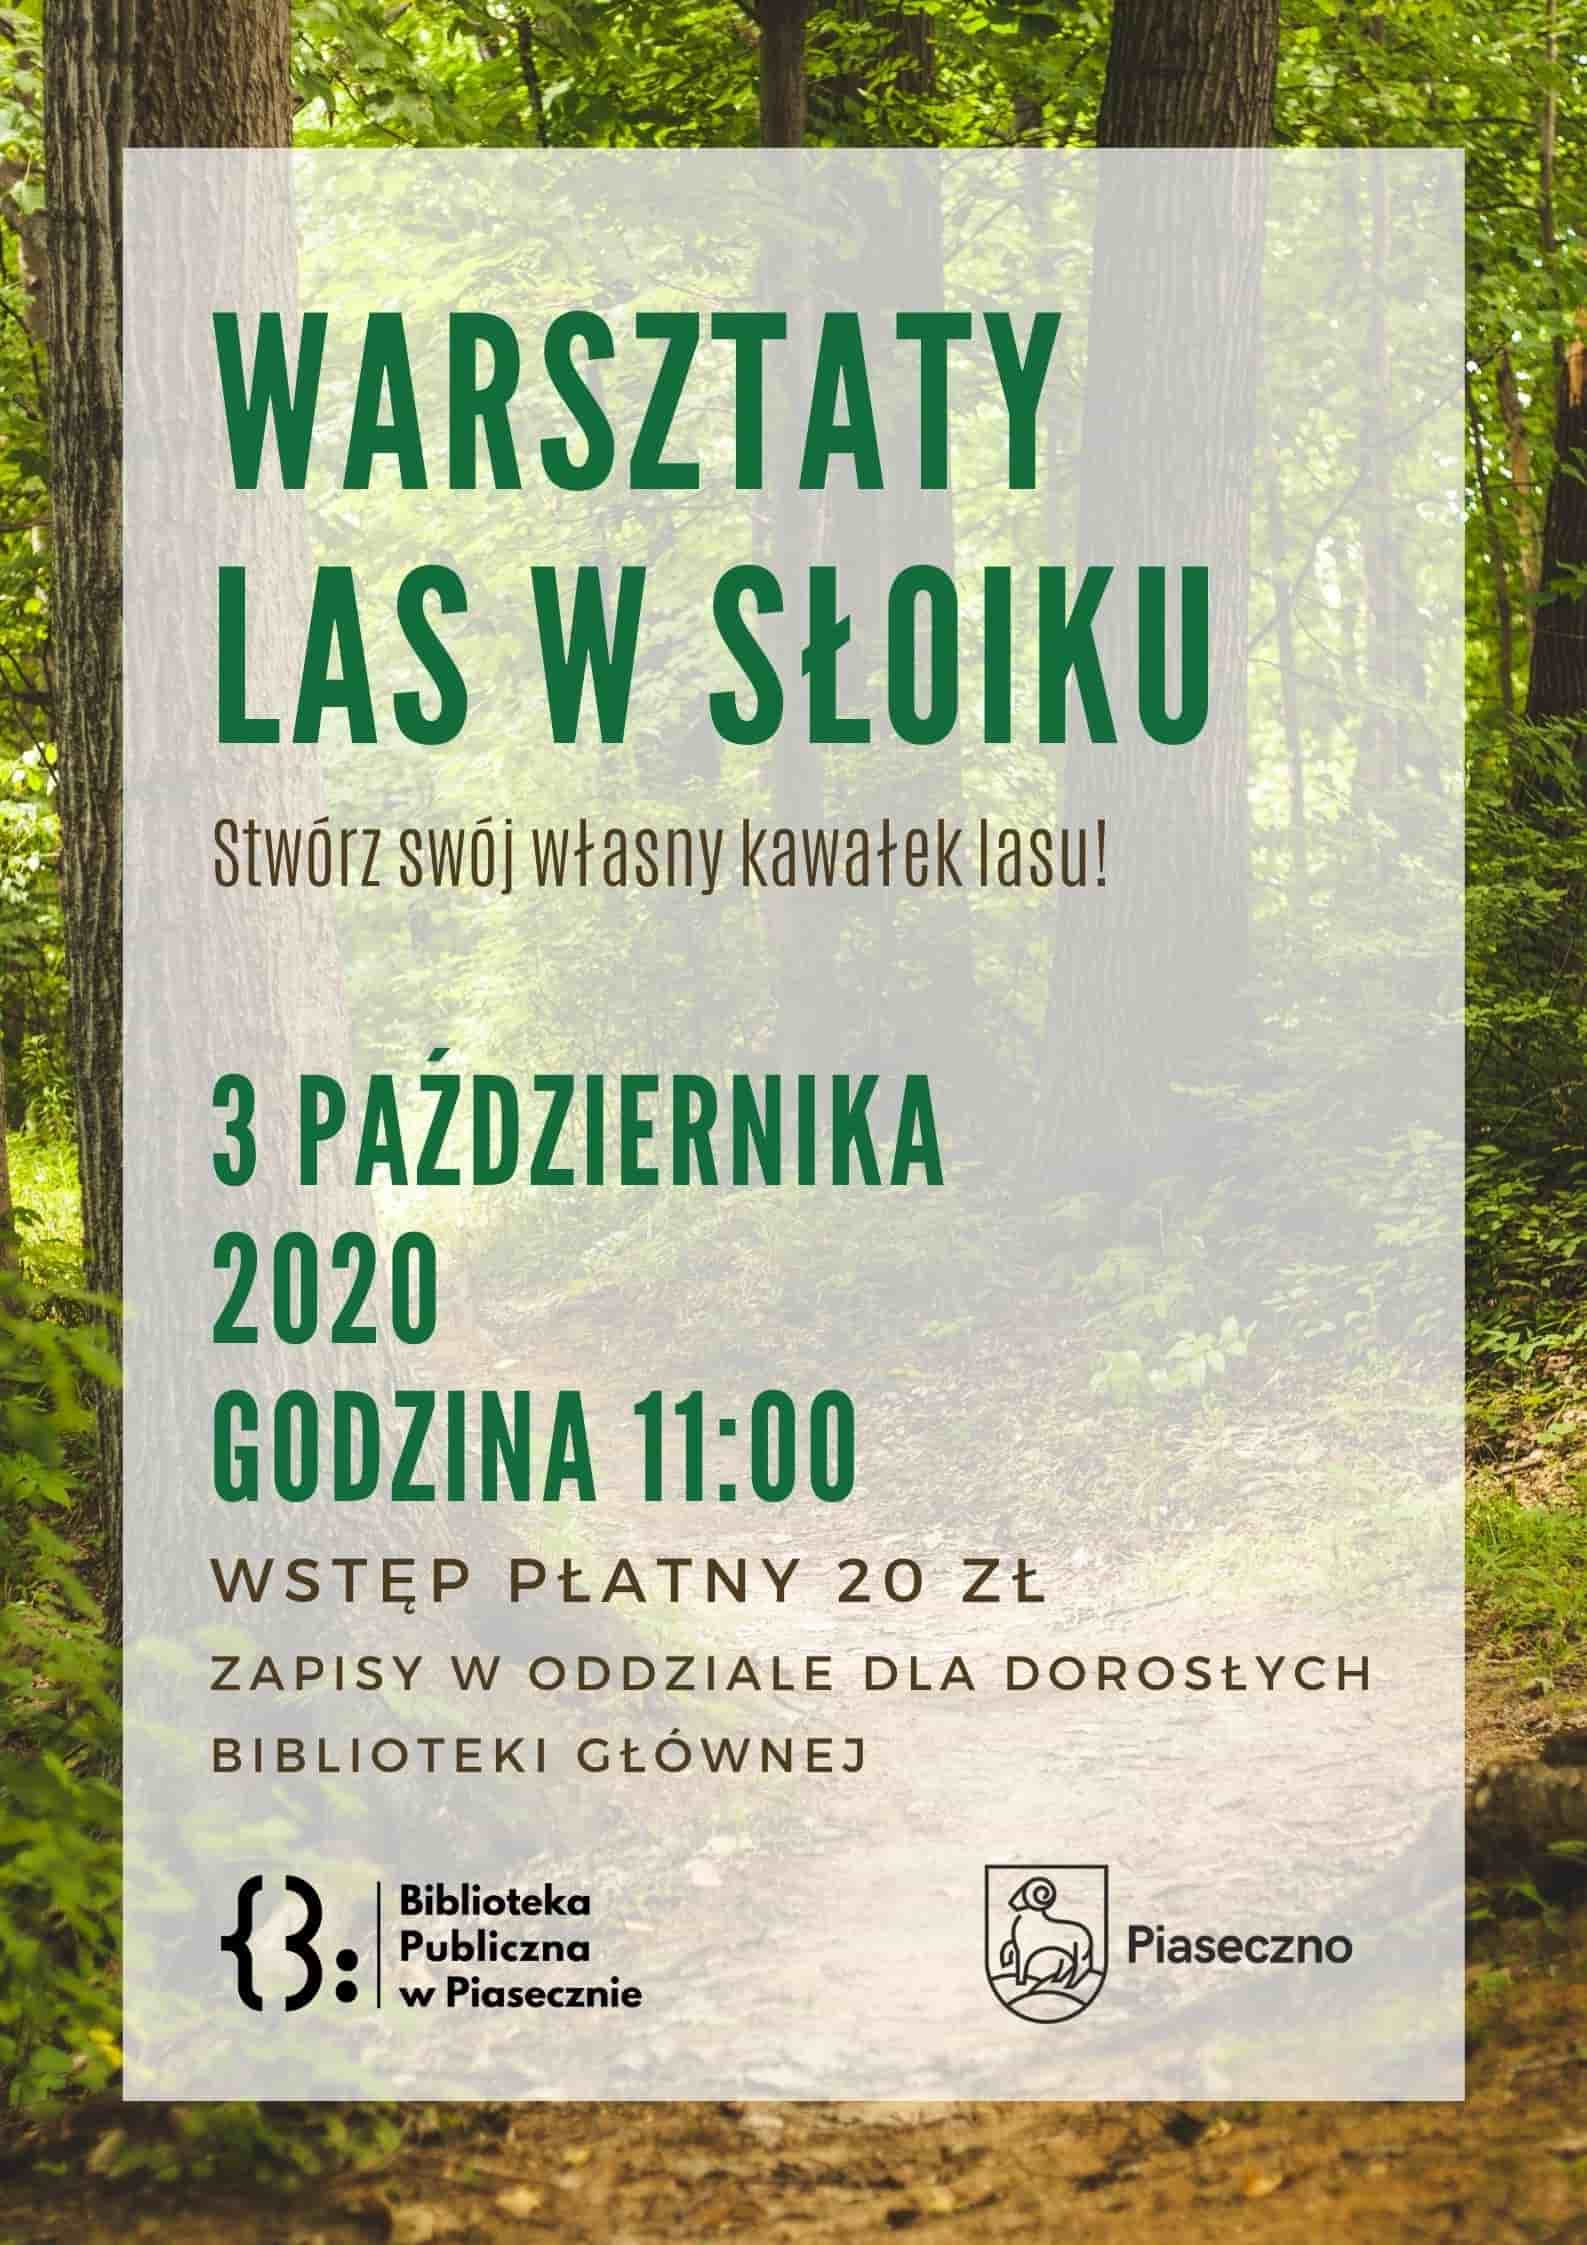 Plakat warsztaty las w słoiku